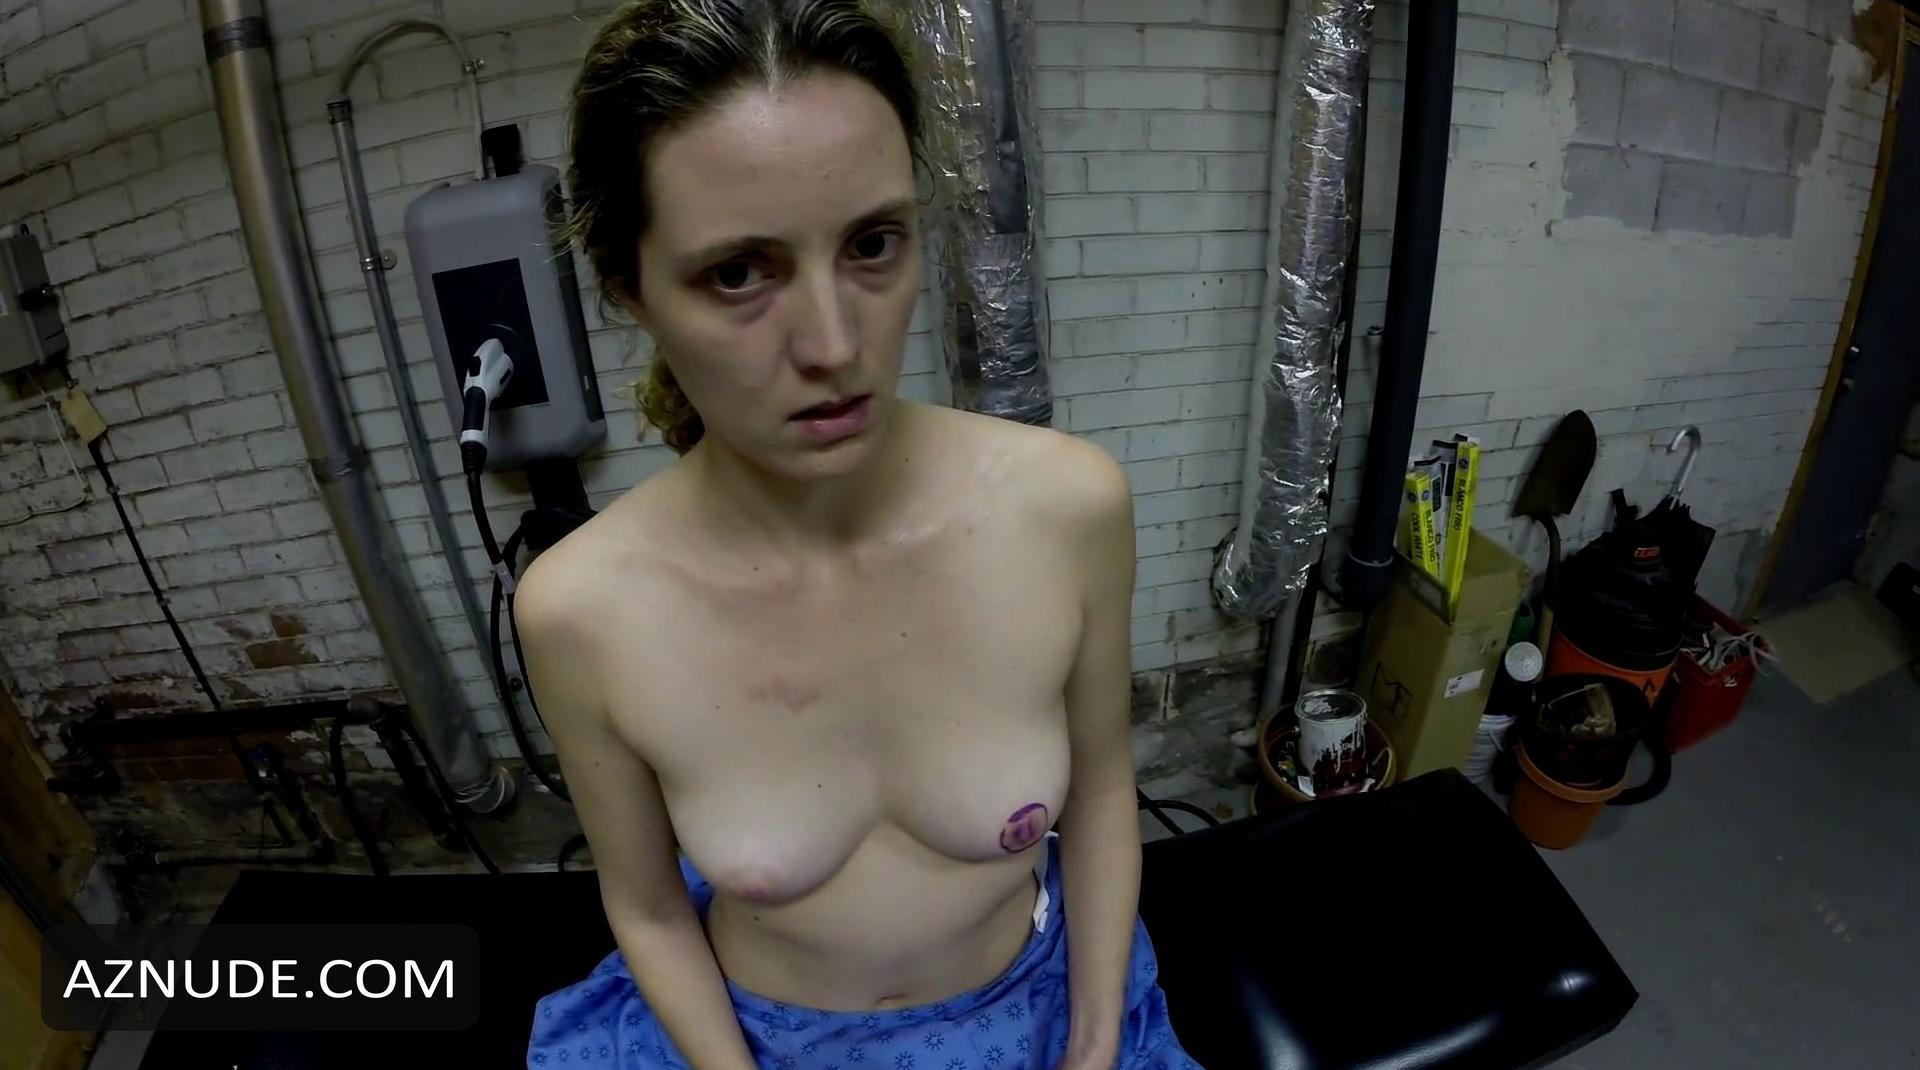 image Farrah abraham sex tape scene 2